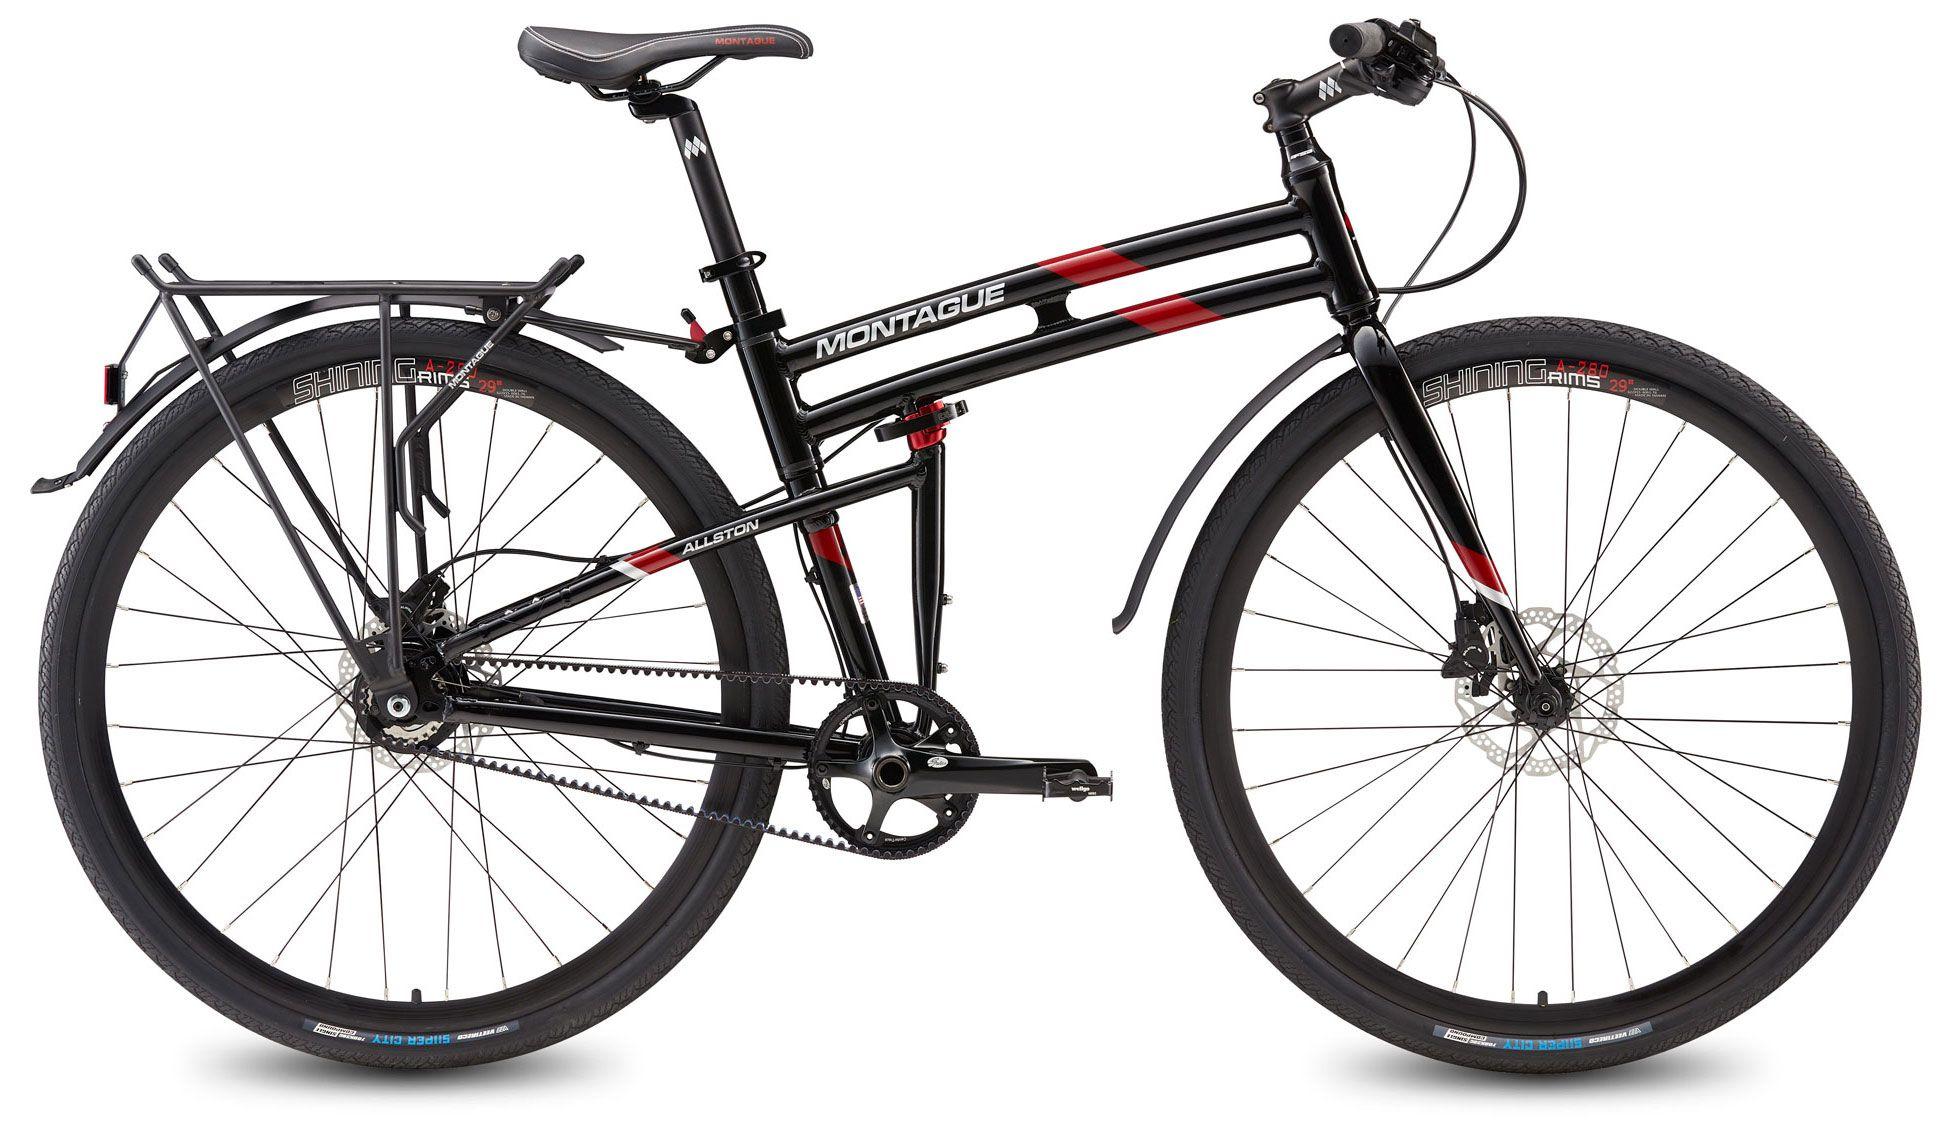 Велосипед Montague Allston 2017,  Складные  - артикул:284227